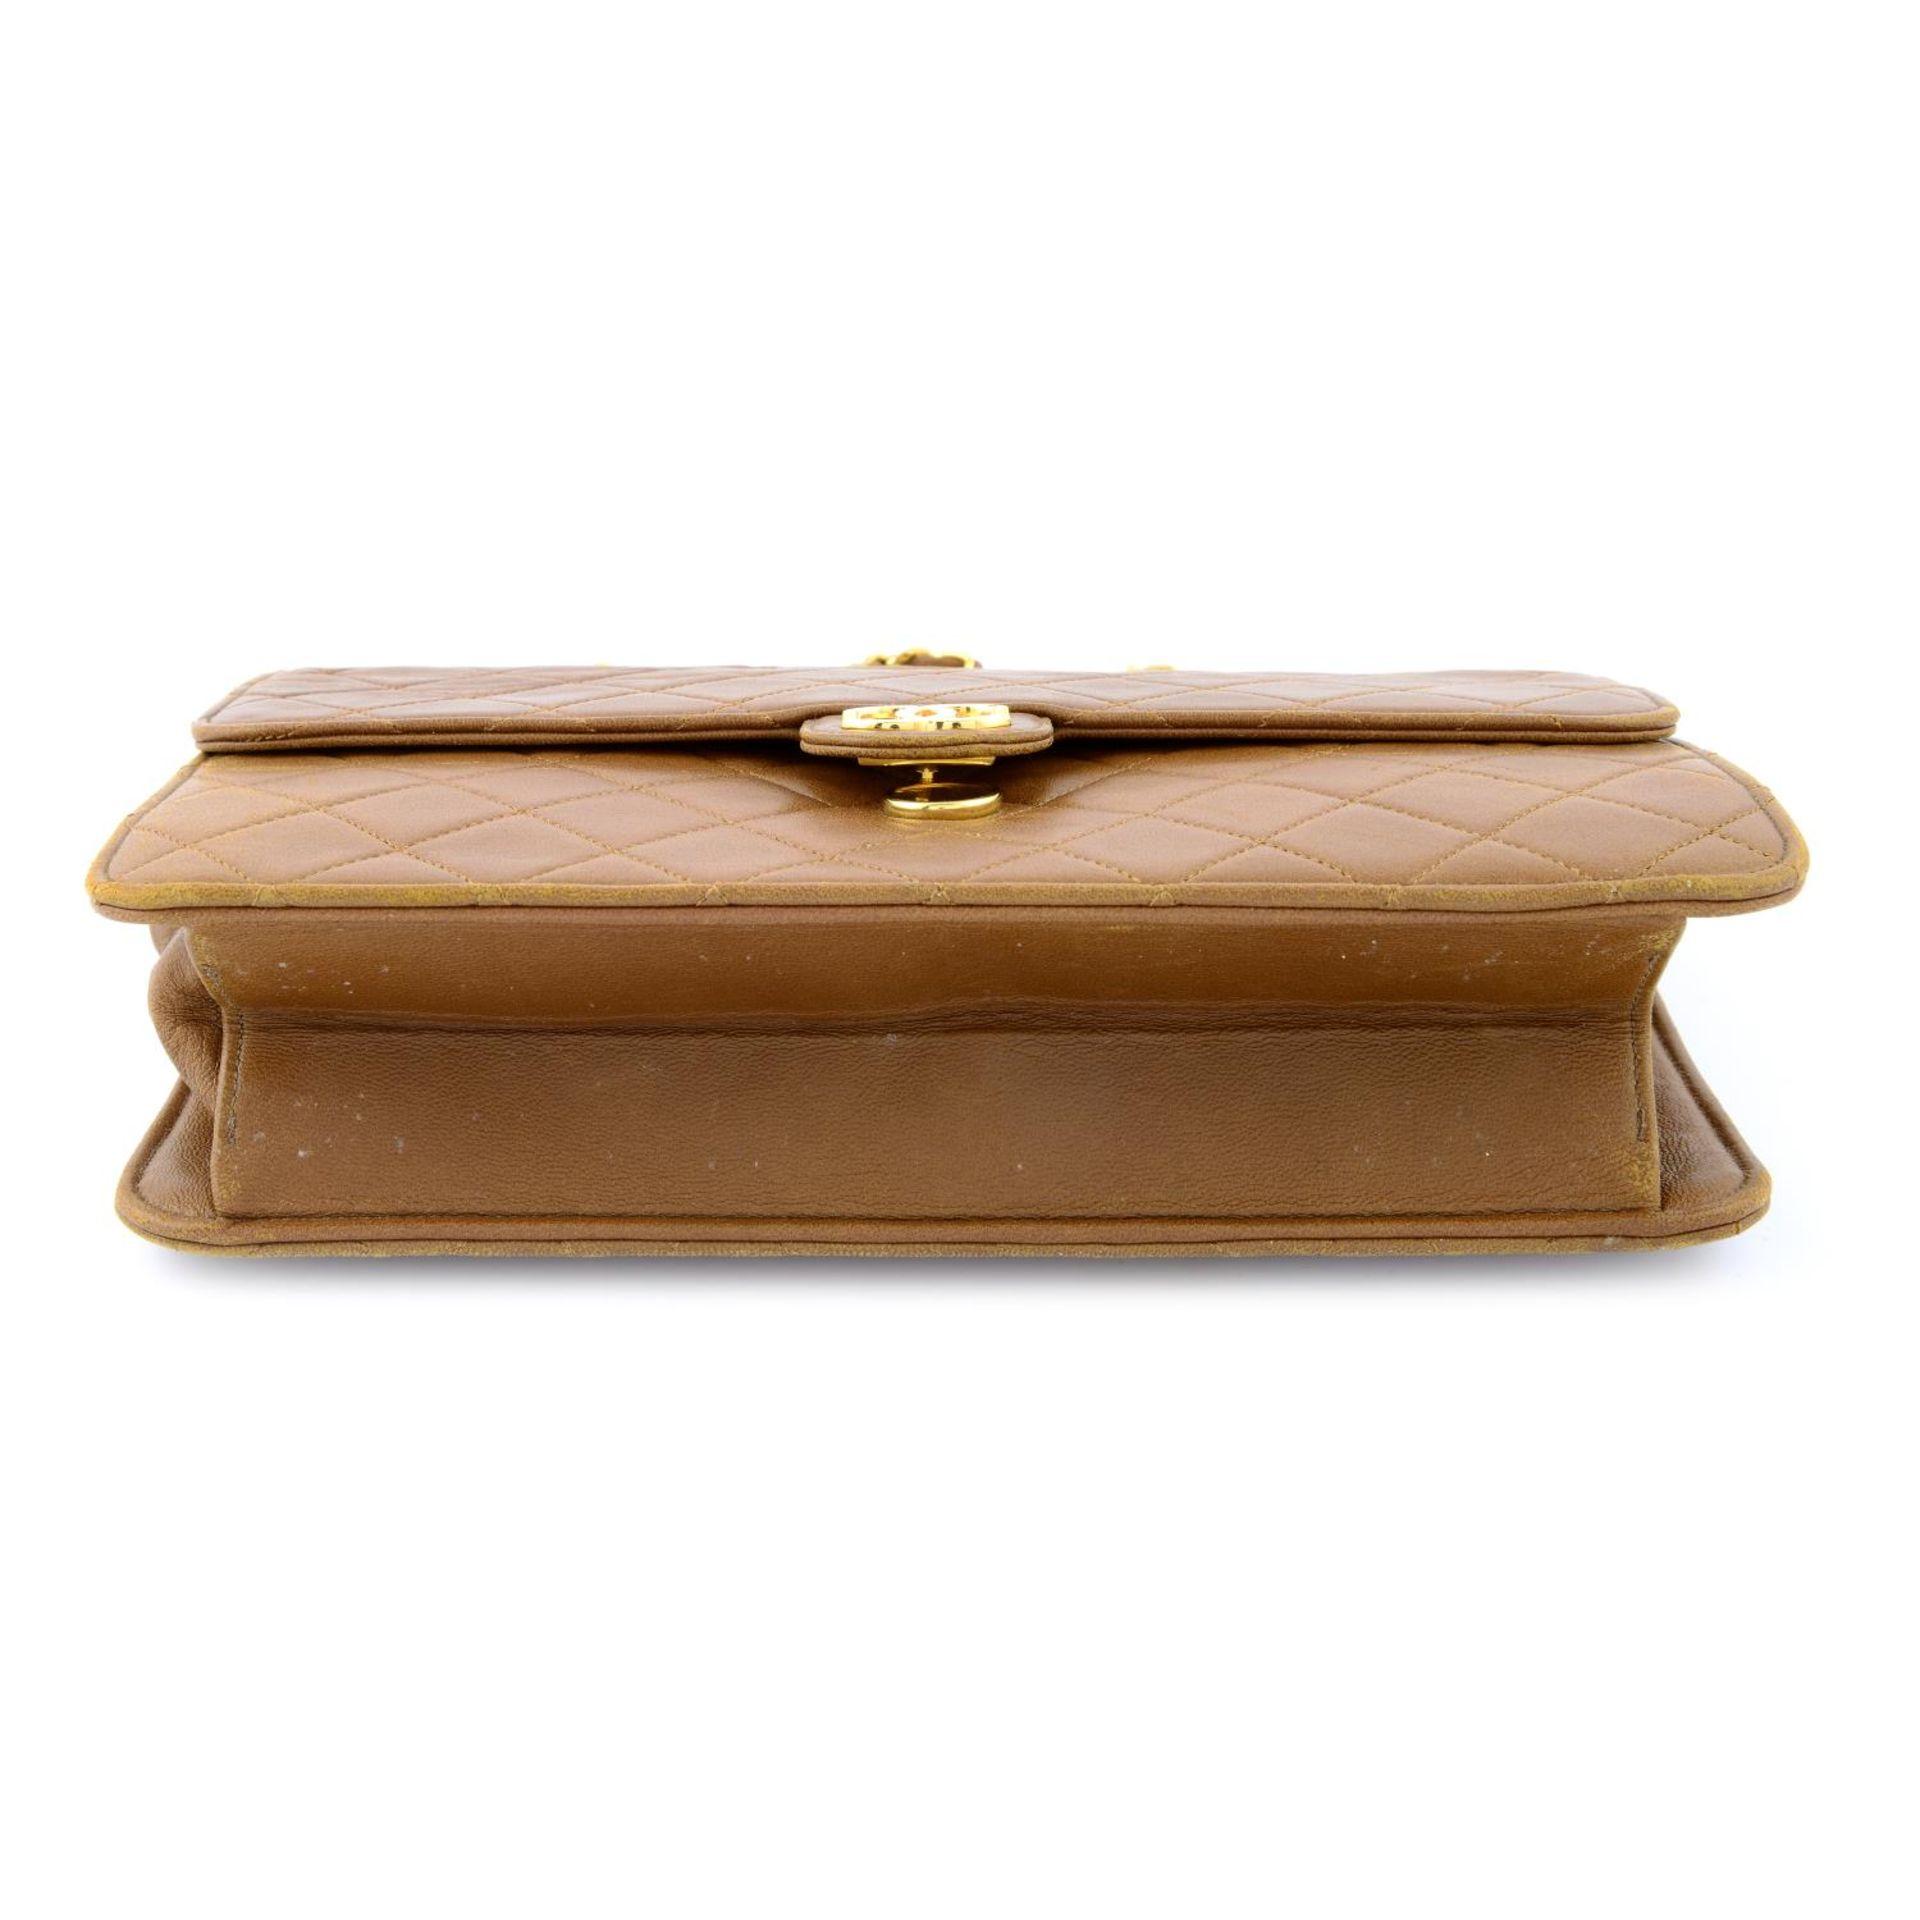 CHANEL - a vintage tan single flap handbag. - Image 5 of 5